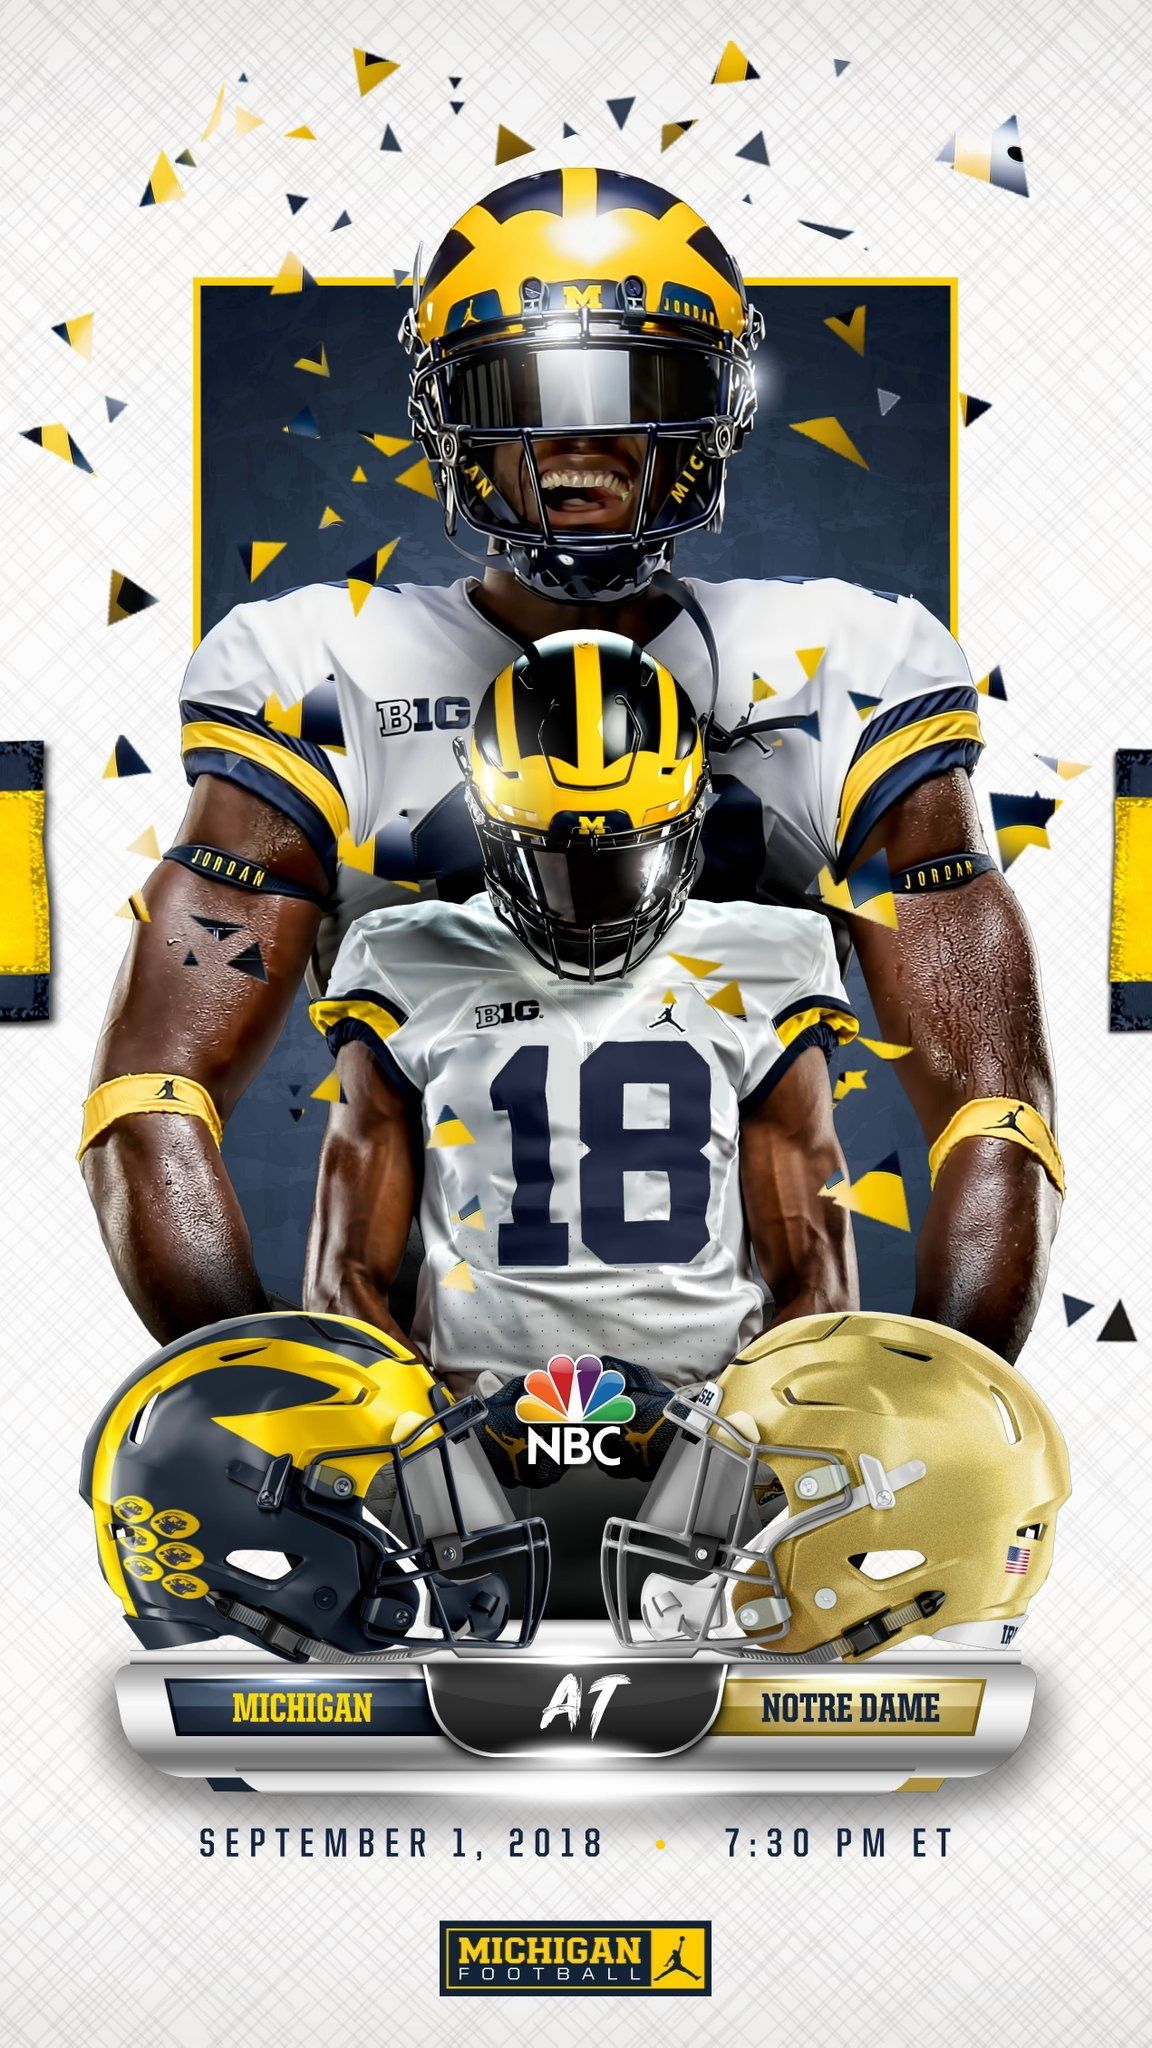 Whos Got It Better Than Us Nooooobodyyyy Go Blue Michigan Wolverines Football Michigan Football Michigan